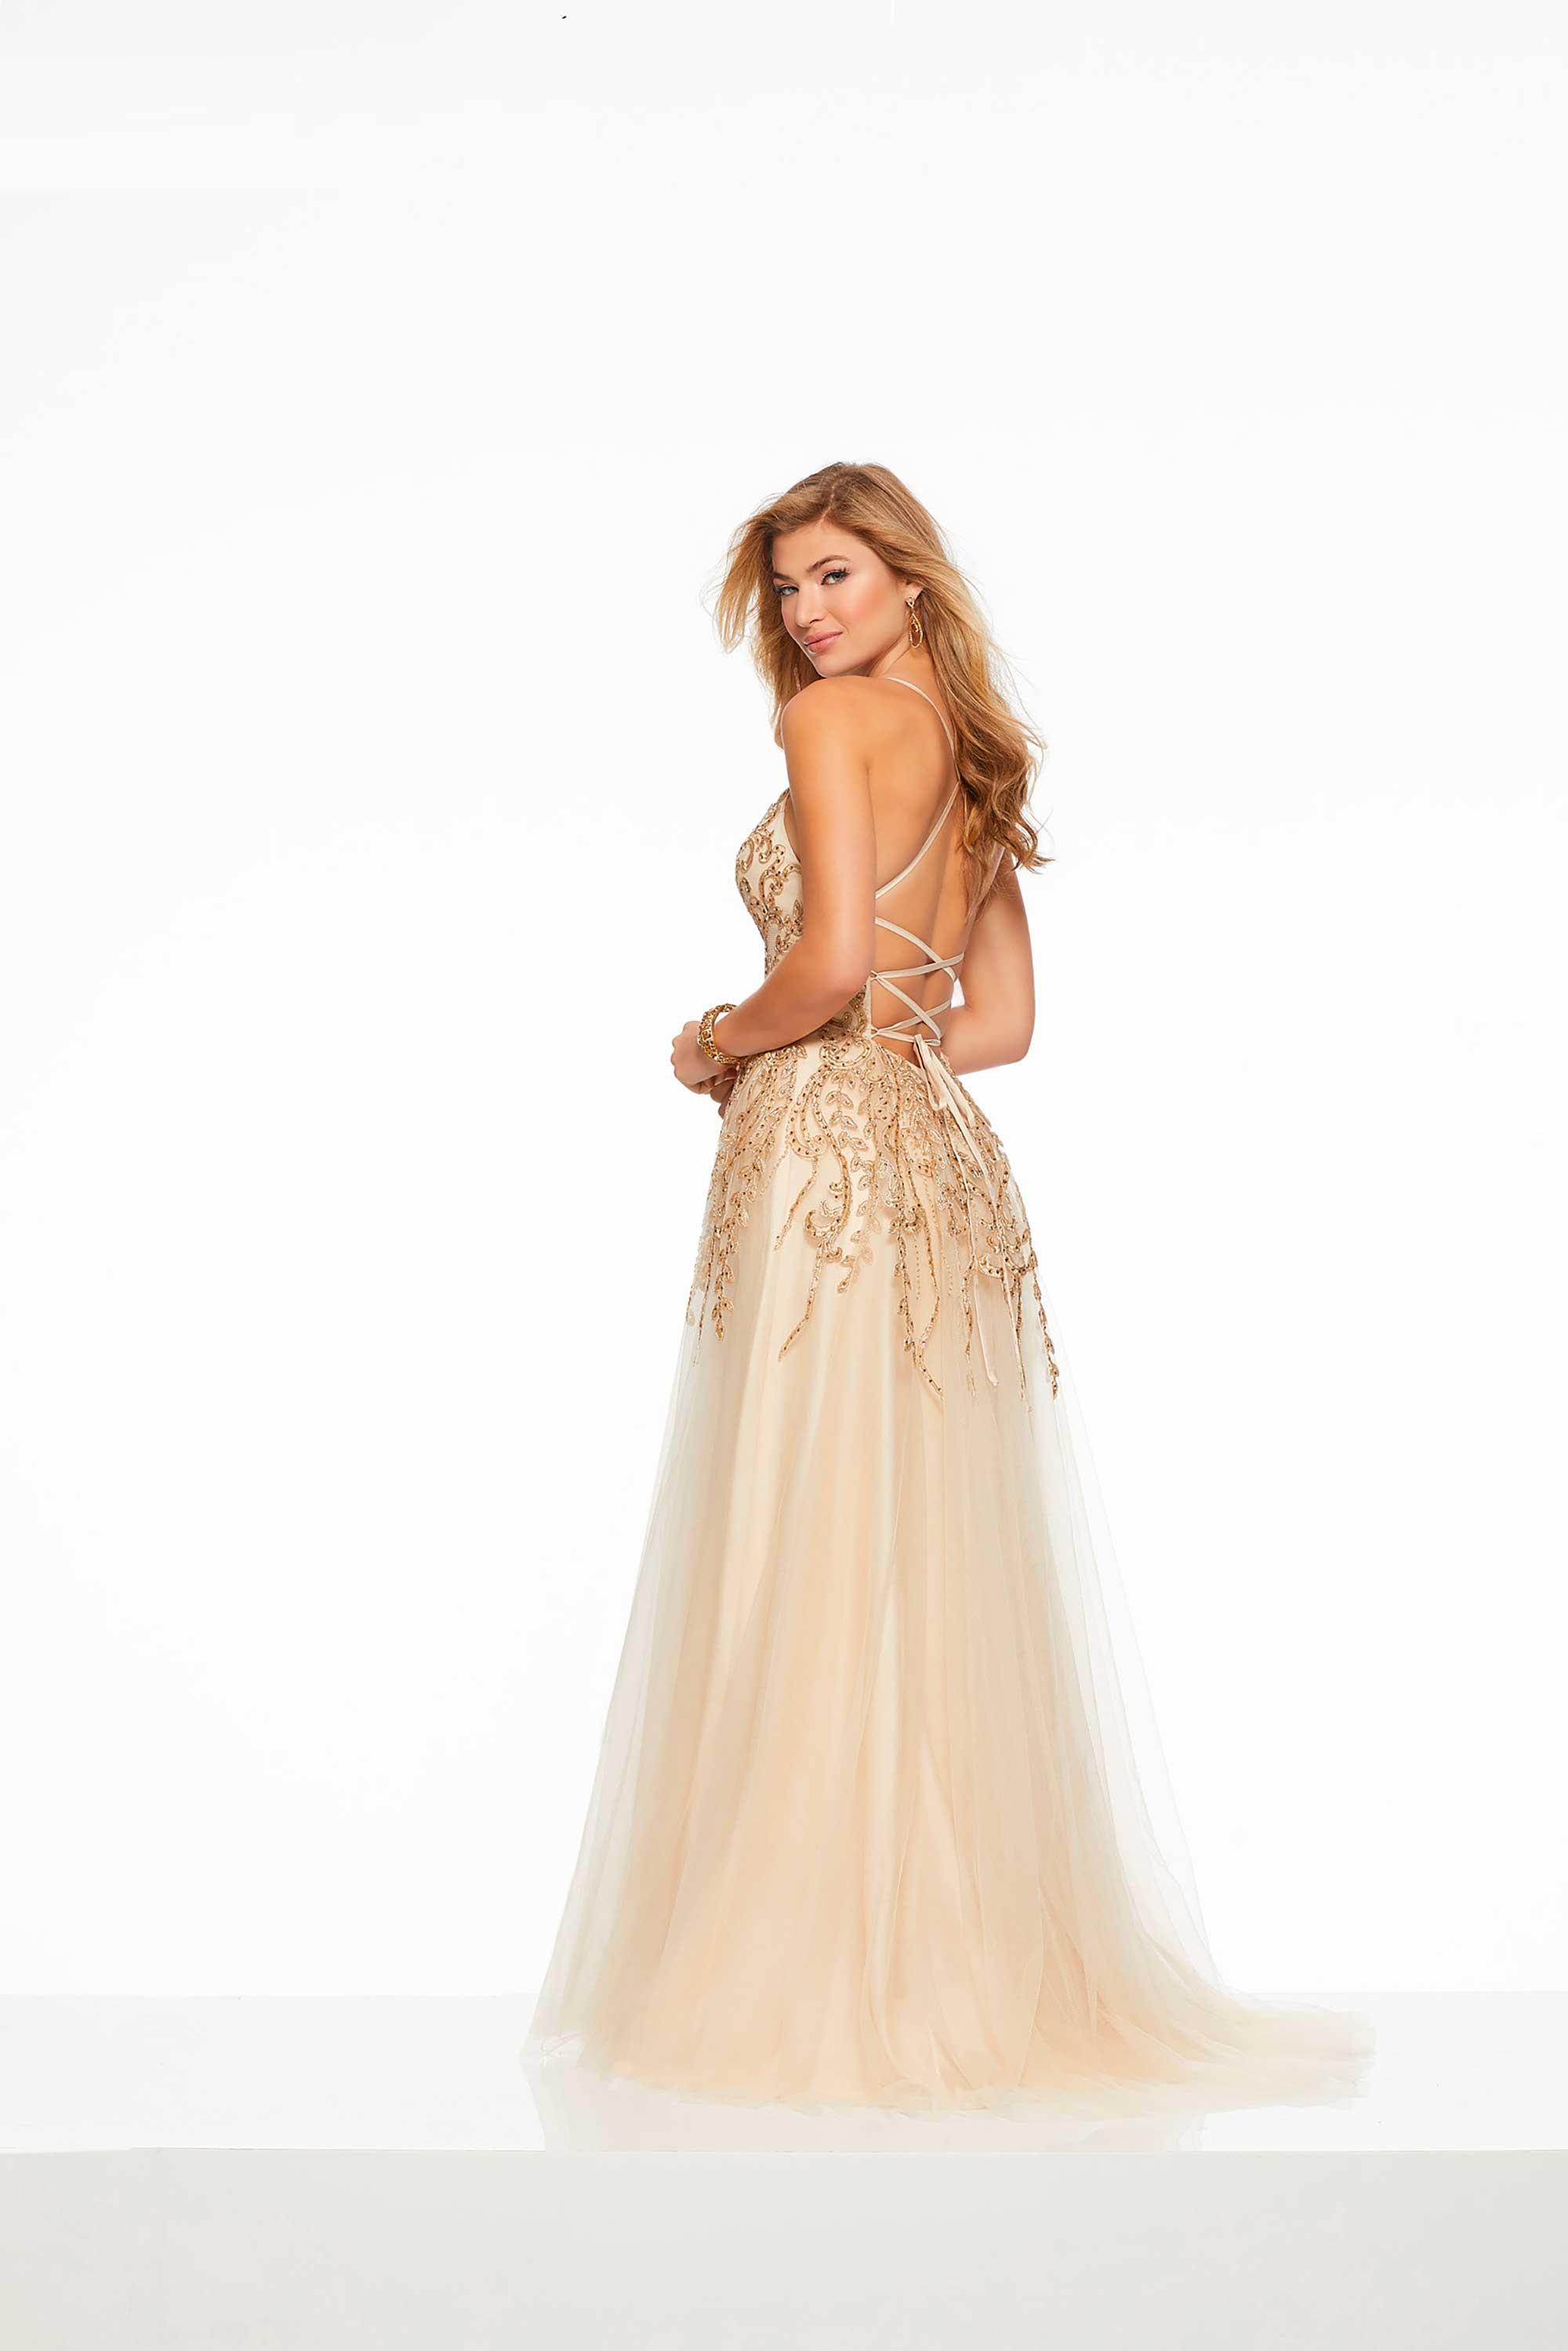 Vestido Lucía Fiesta 2019 mod. 43027 - 7